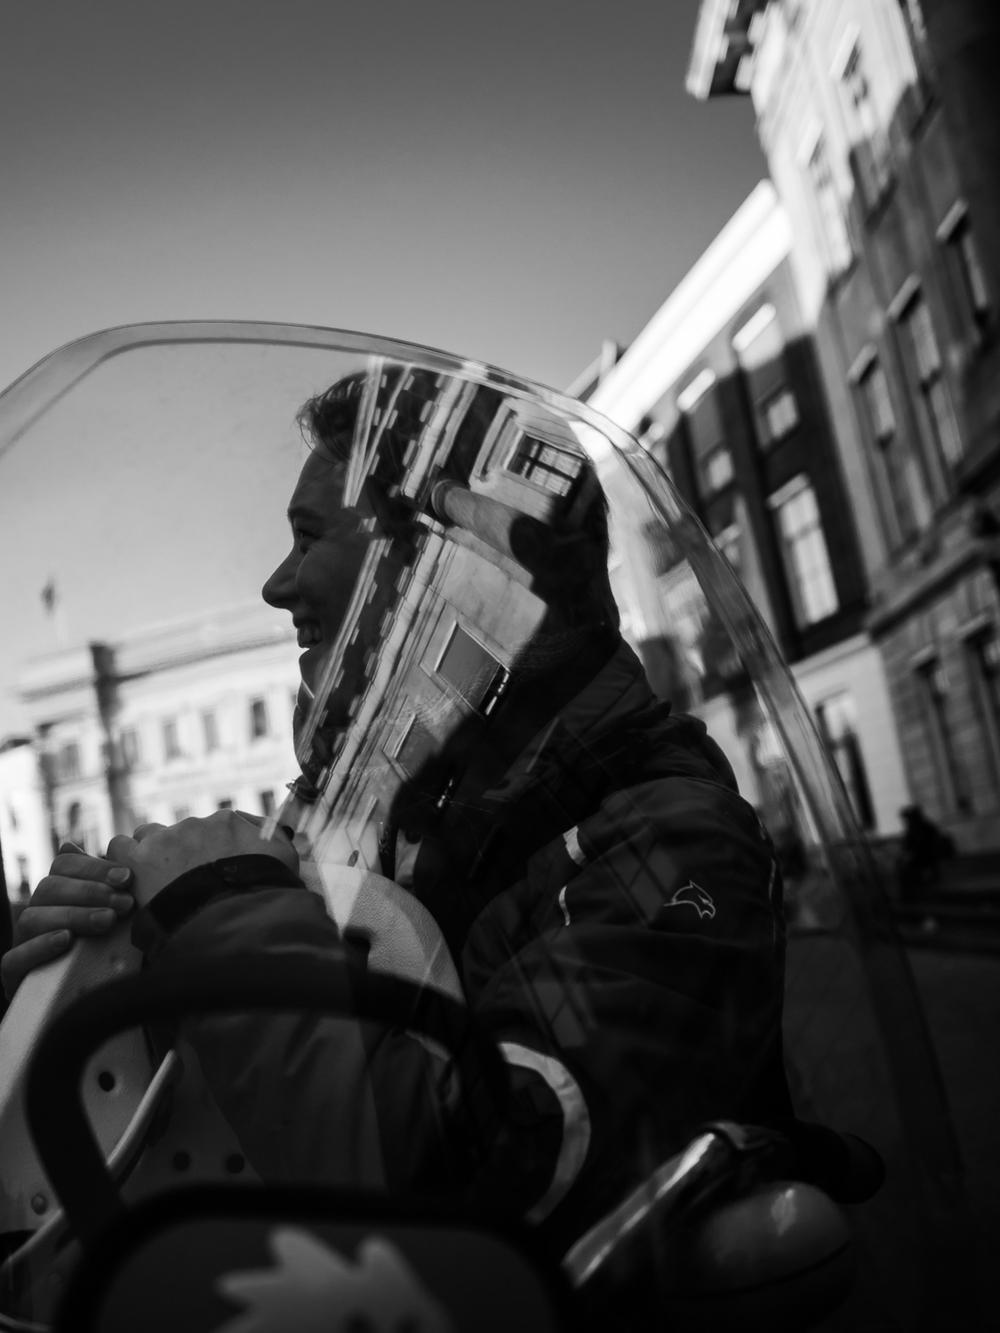 fokko muller street photography - 141121 - 006.jpg